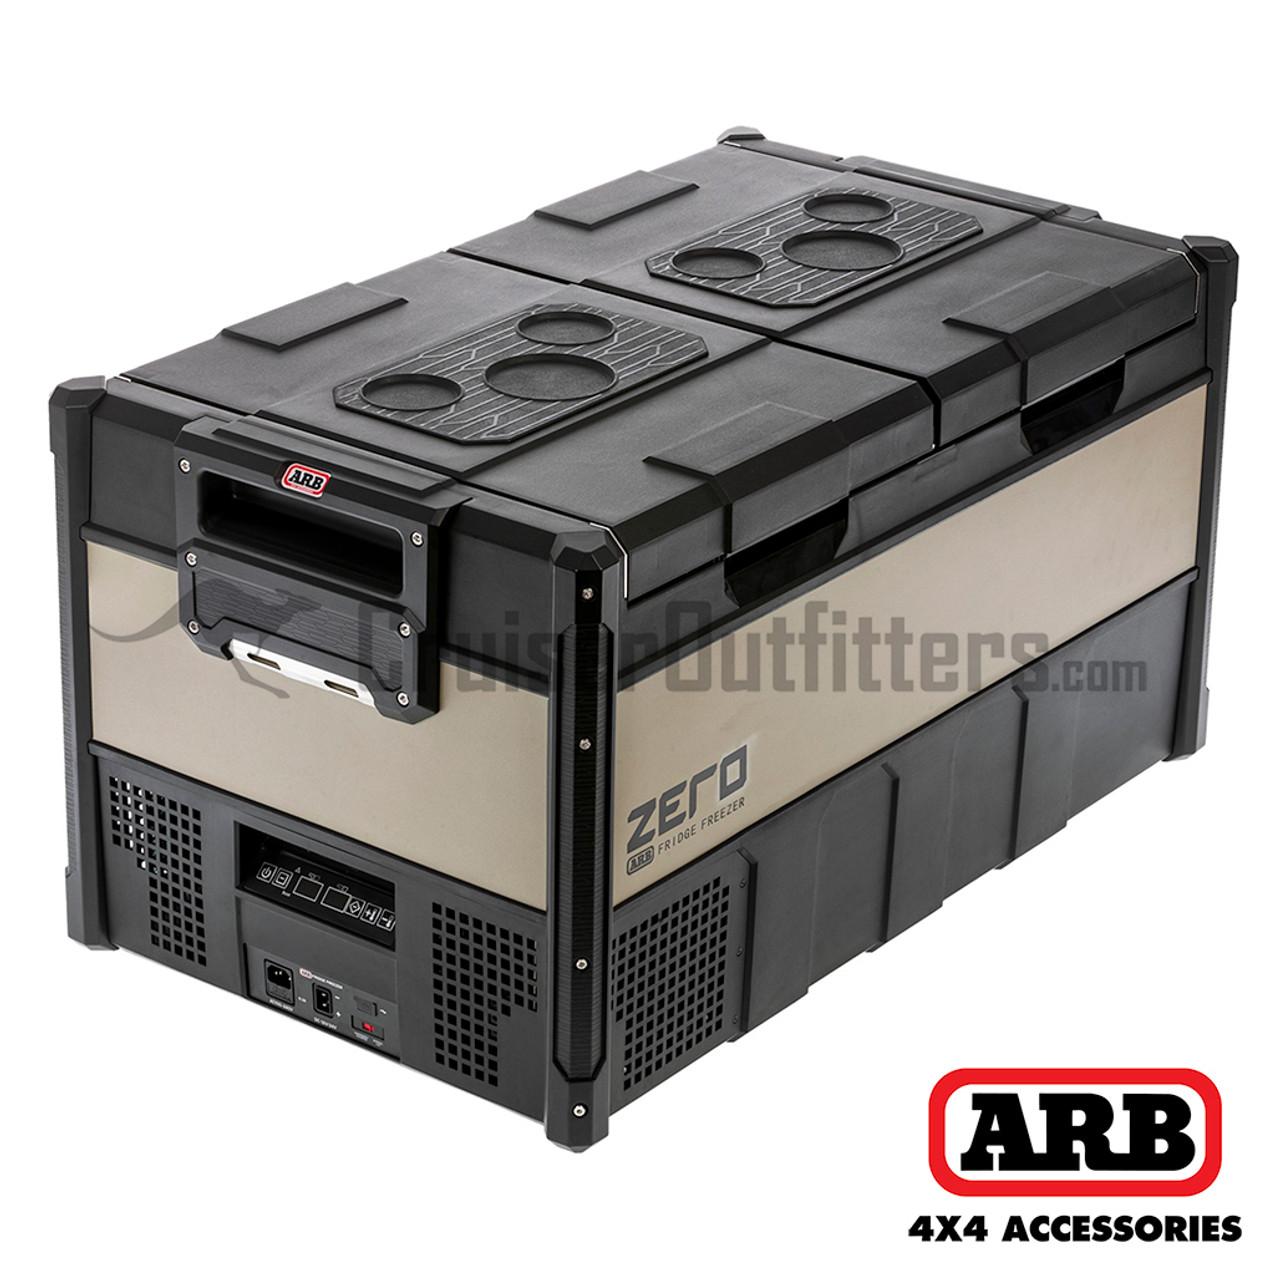 ARB Zero Fridge Freezer Dual Zone - 73 Qt (ARB10802692)